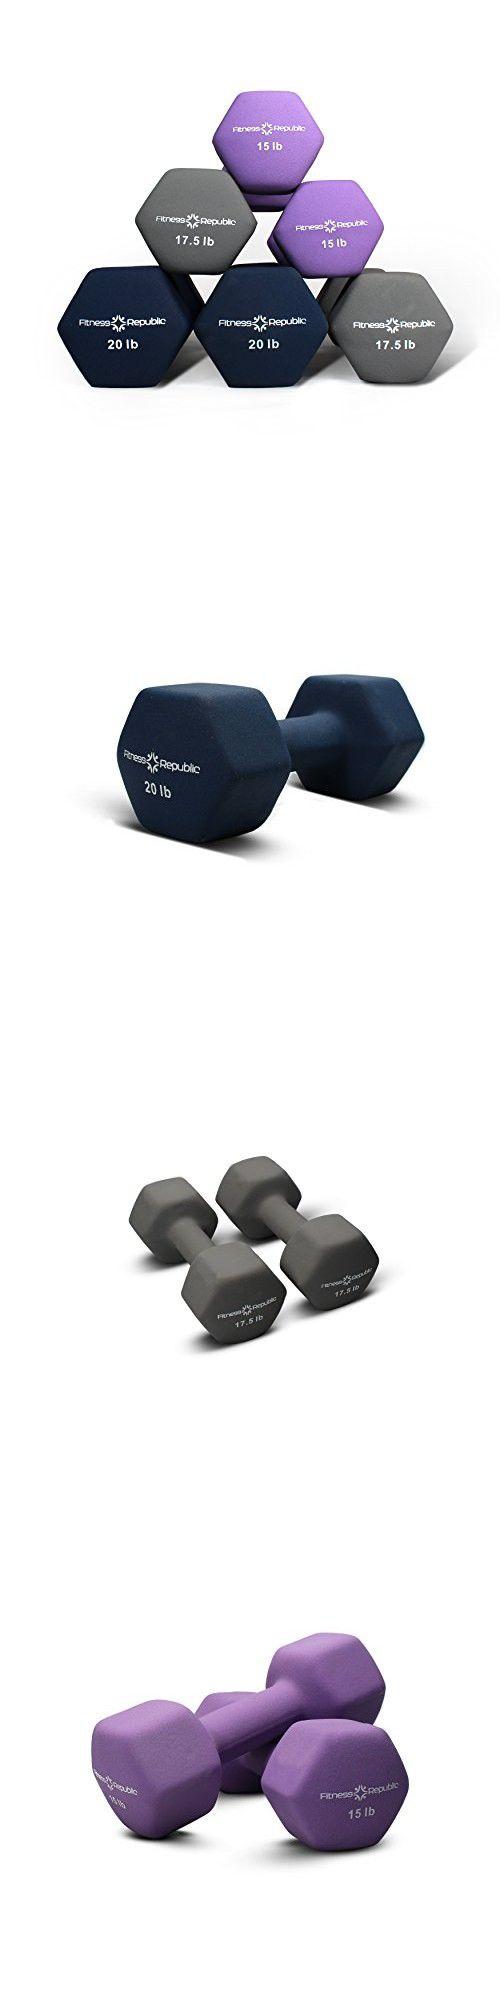 Fitness Republic Neoprene Dumbbell Pairs (Heavy) 15lb,17.5lb & 20lbs